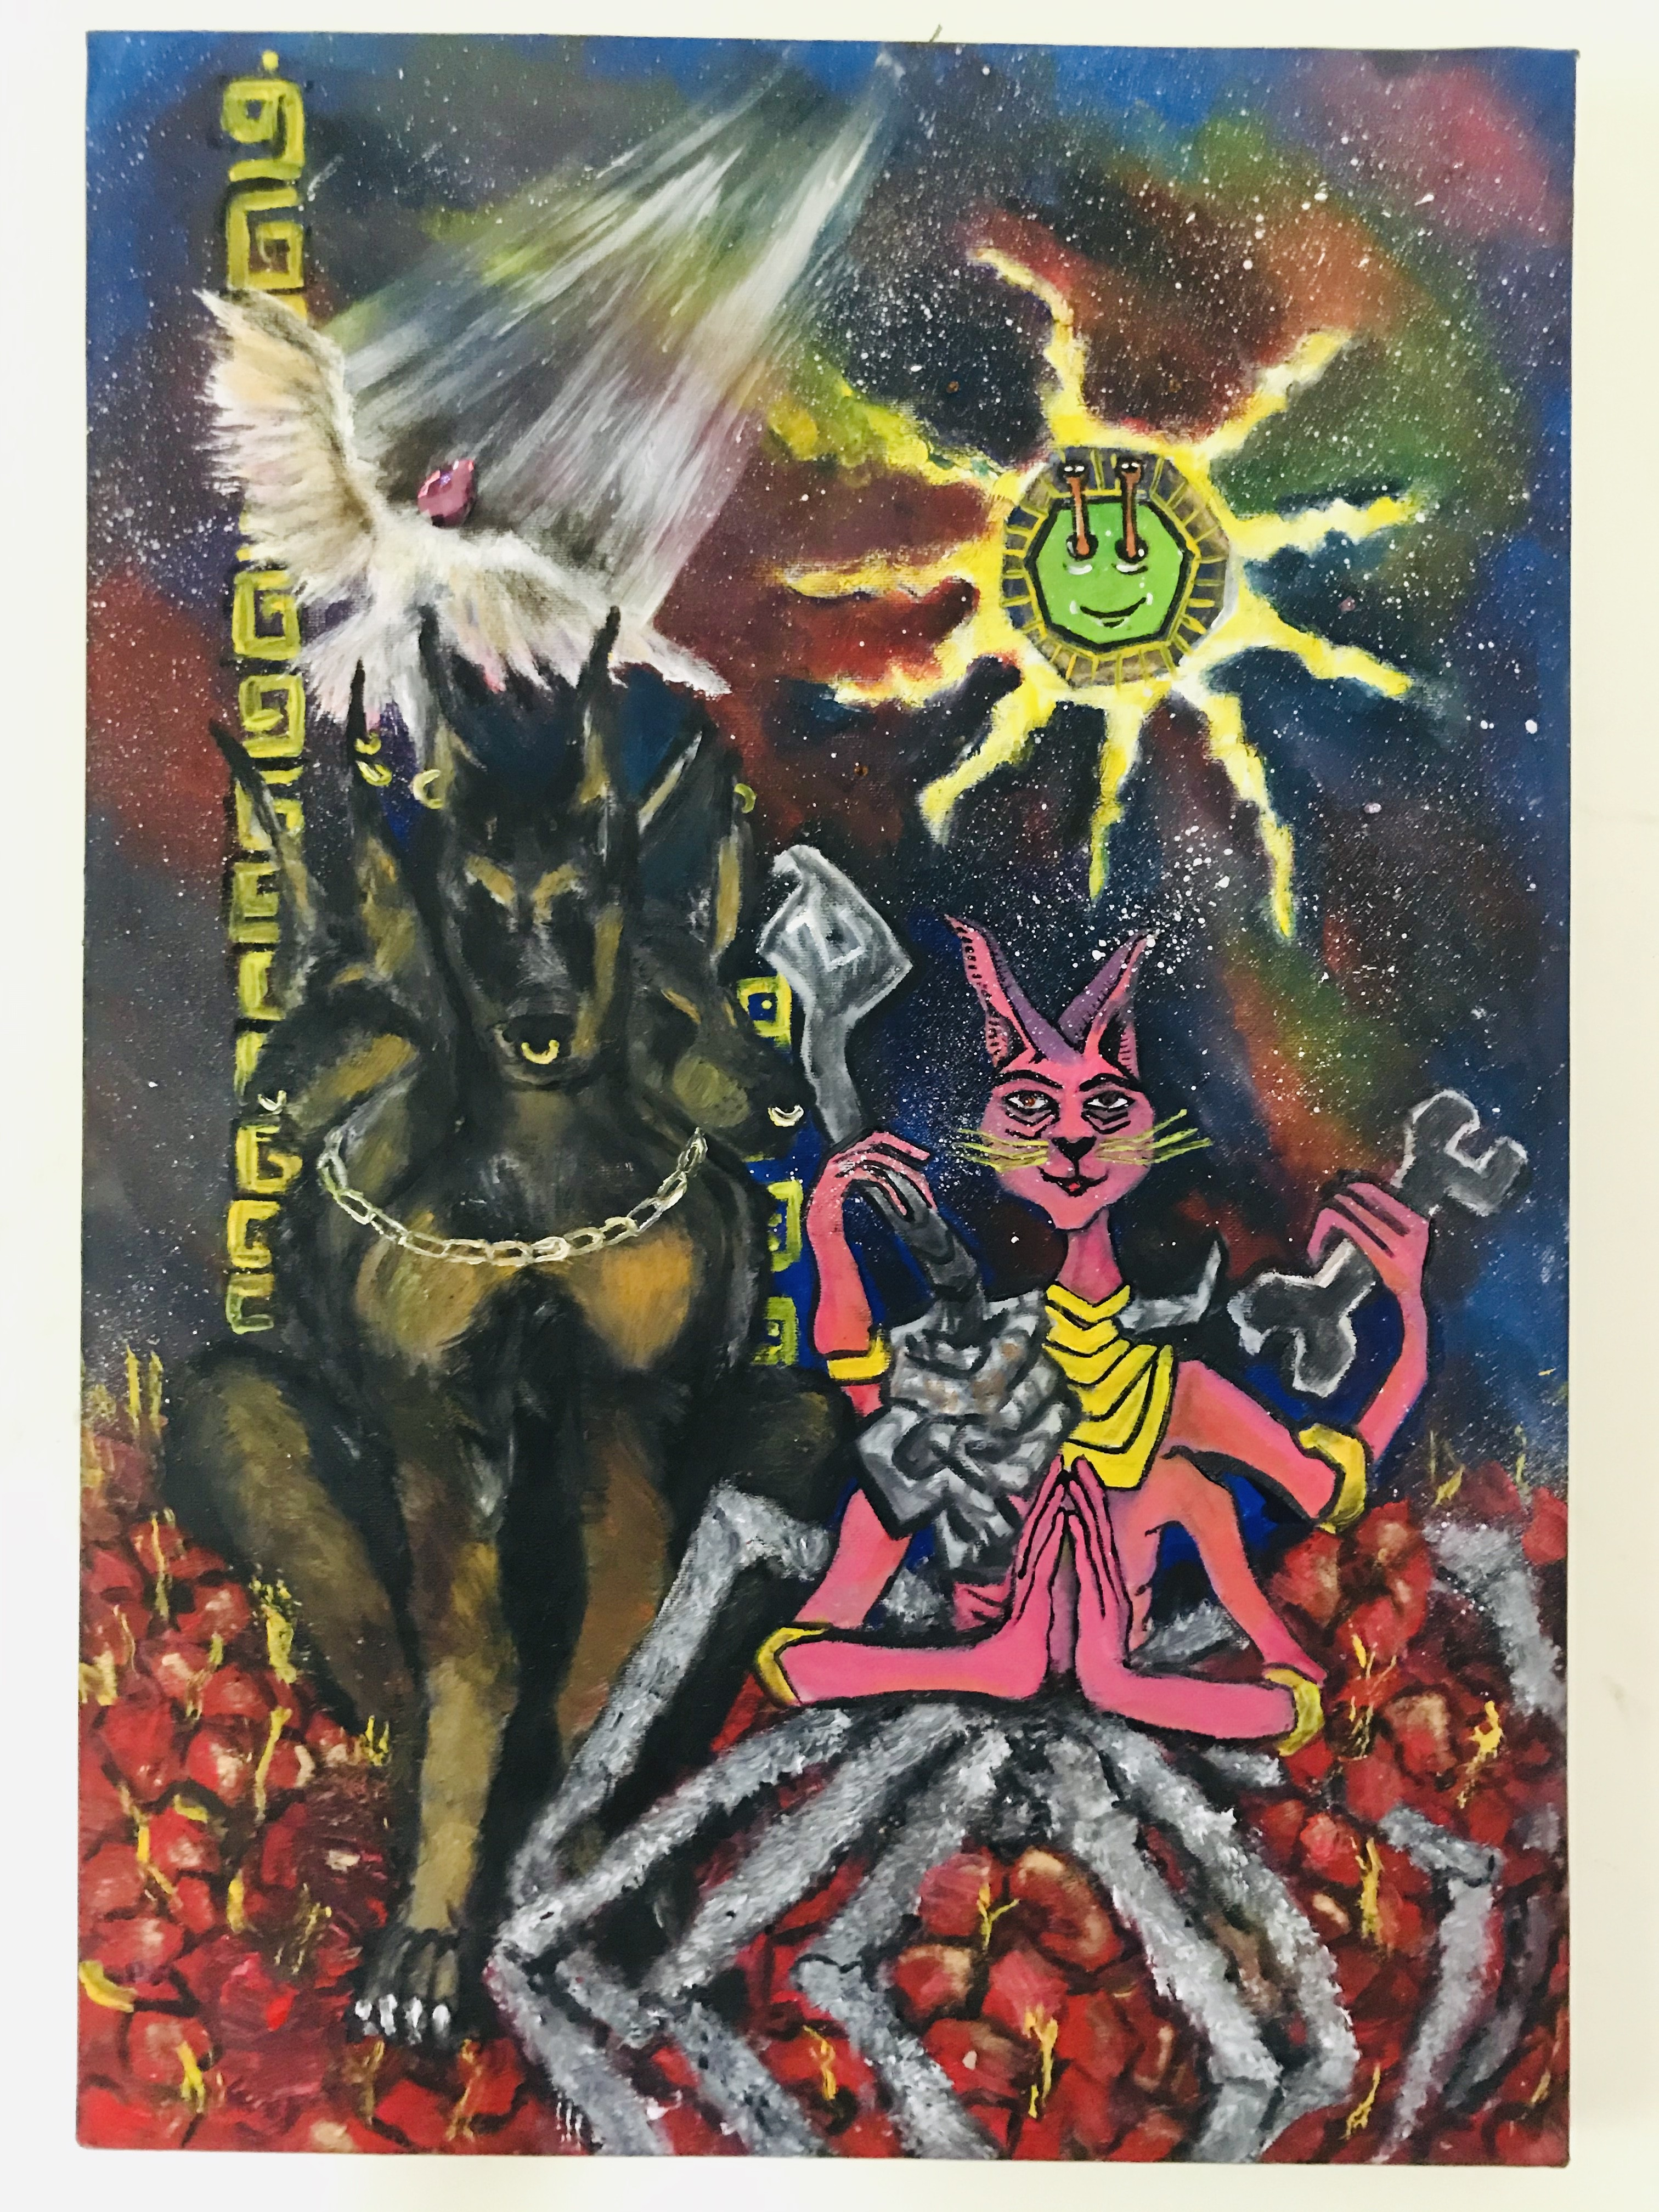 Interdimensional beings by Sanduni Bandara